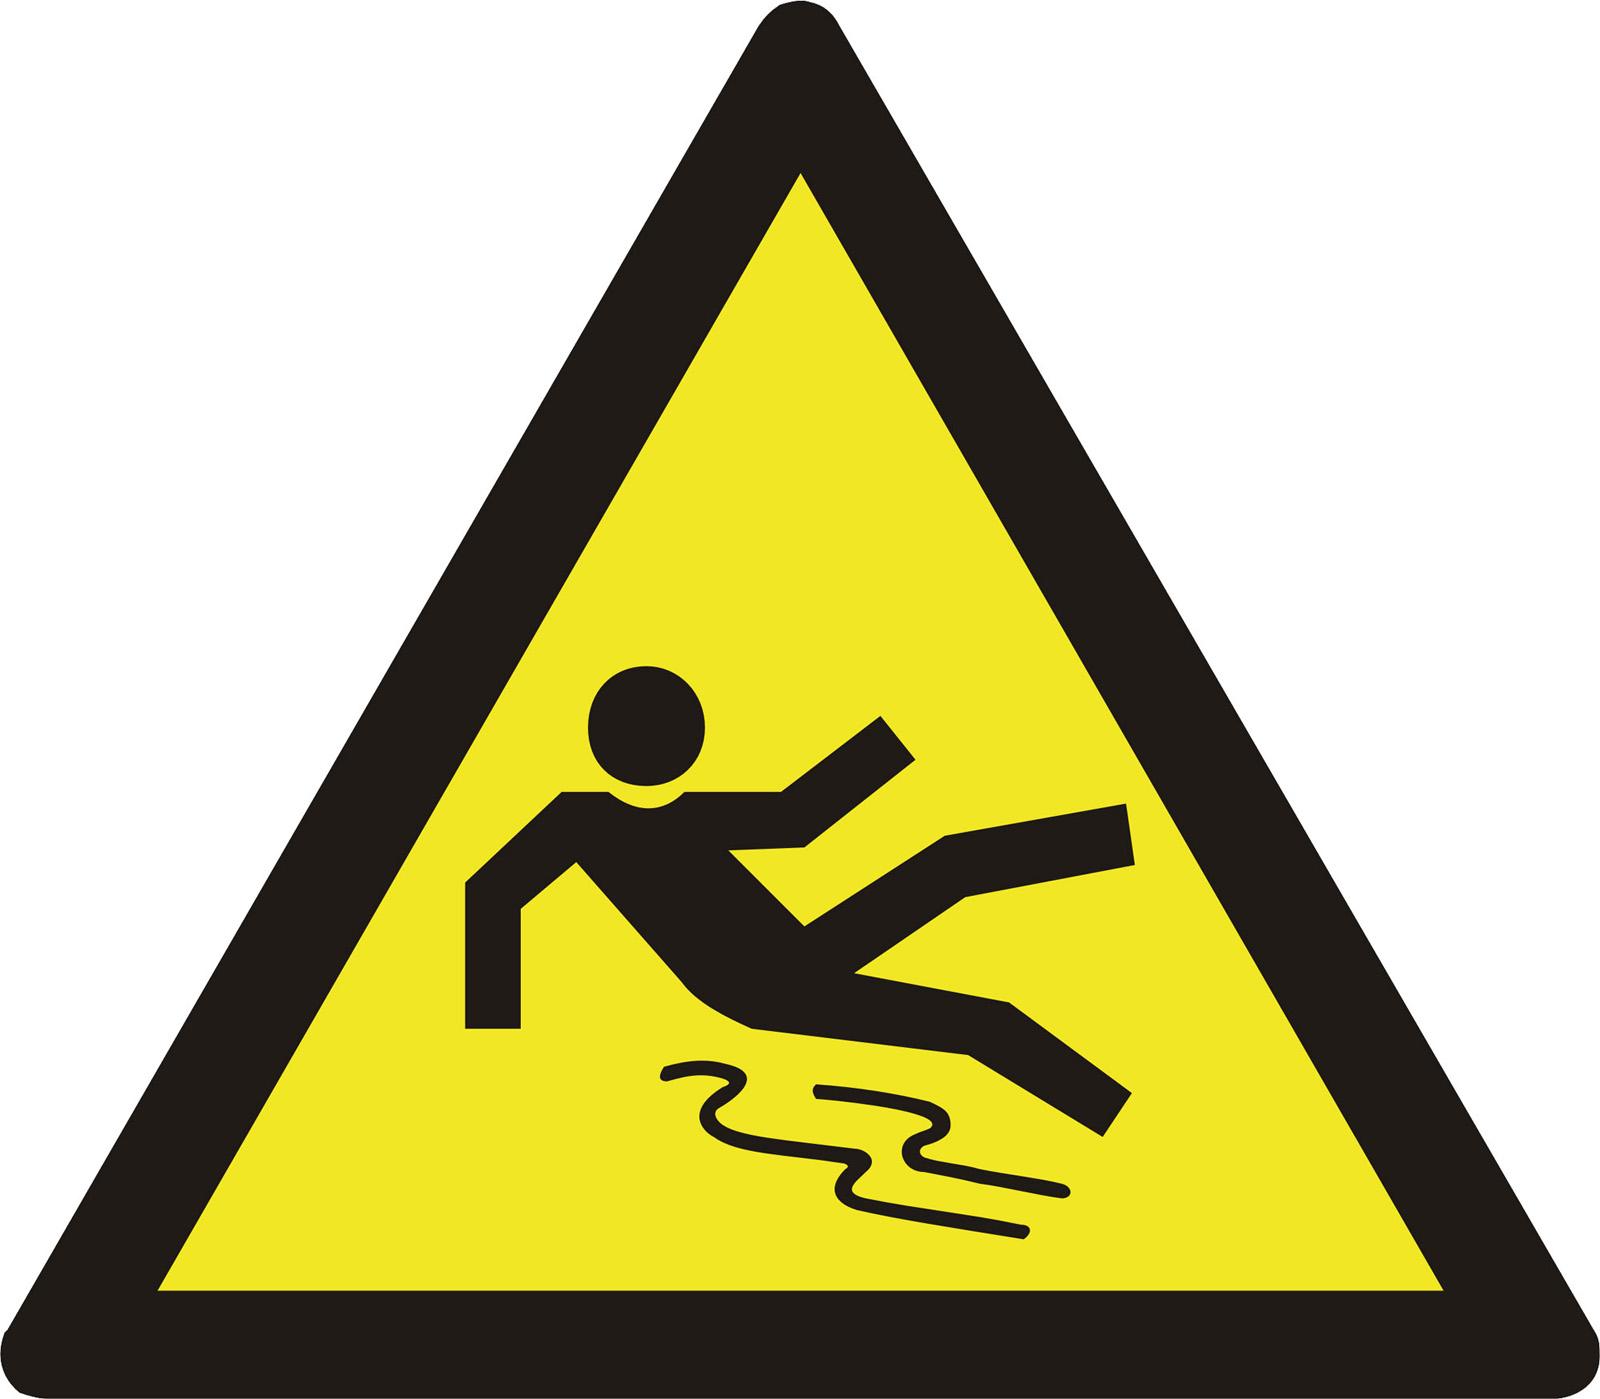 hazard - photo #16